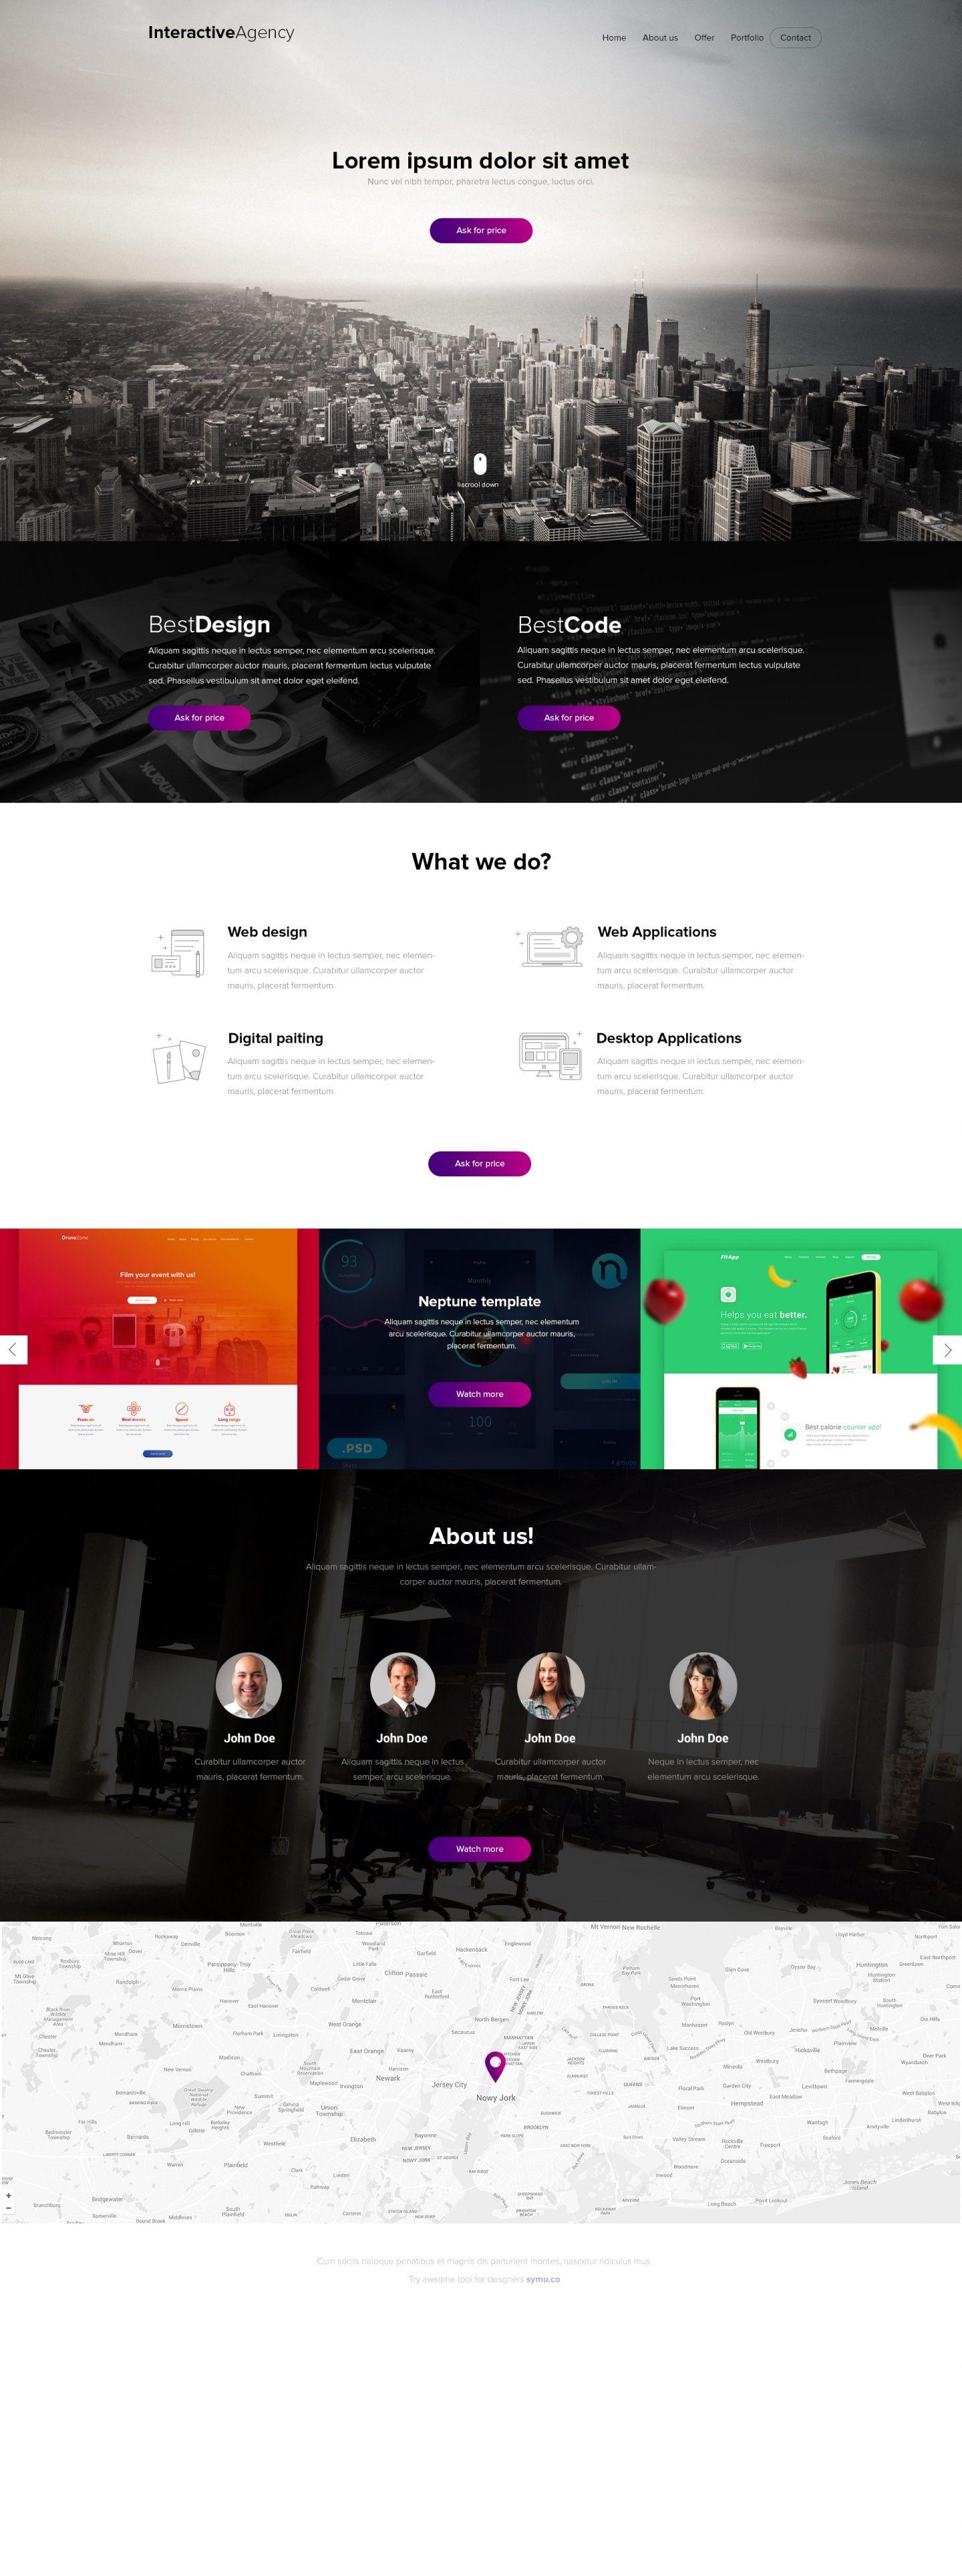 Interactive Agency - PSD template | Web Design Inspiration | Pinterest